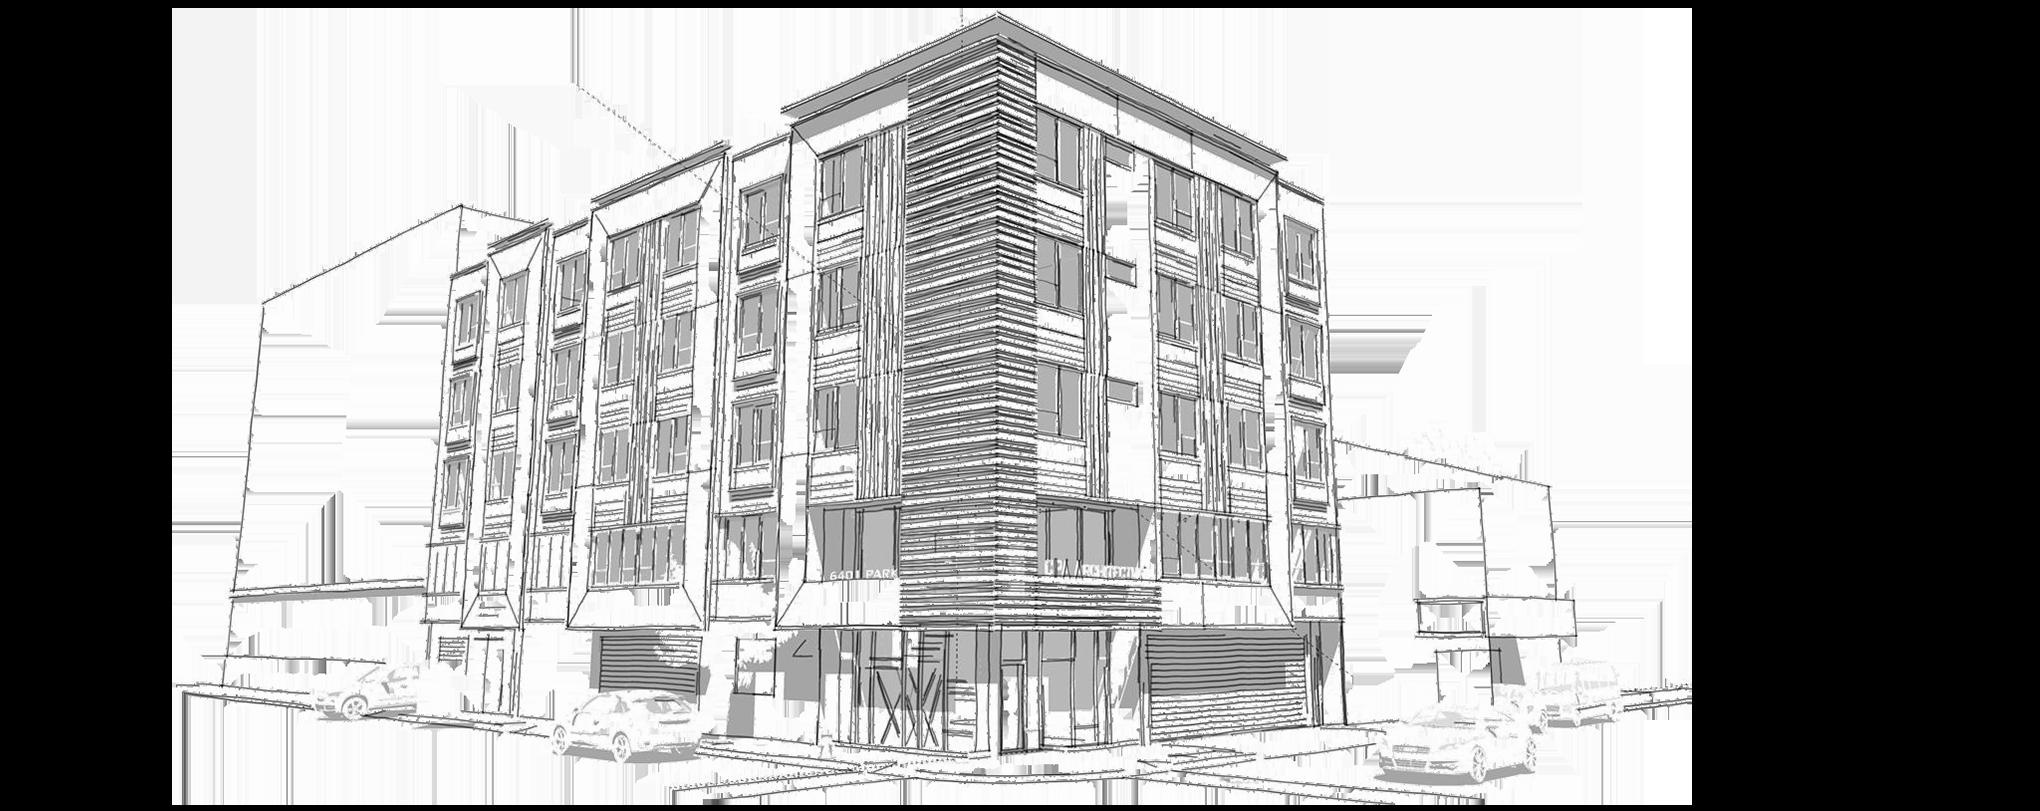 Cpa Architecture Unique Expertise